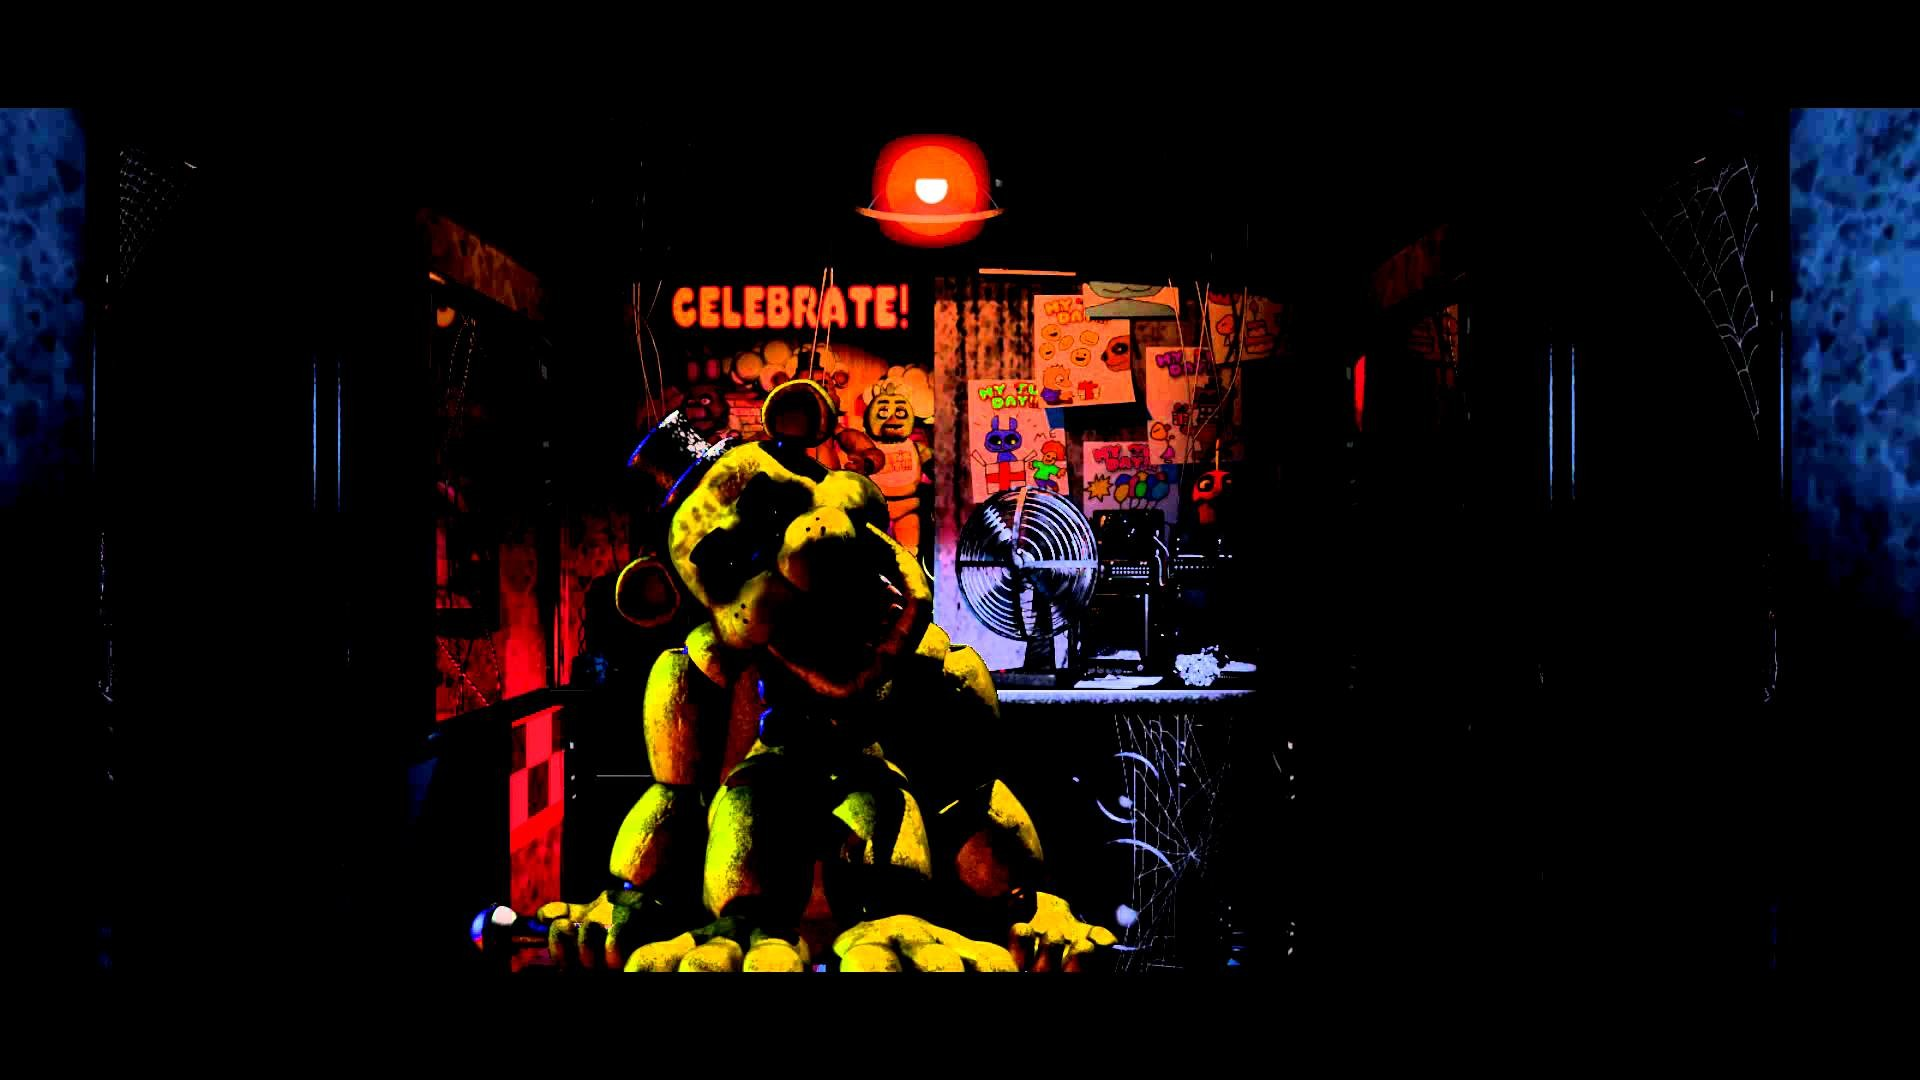 Disturbing Video Game Music 69: Freddy's Theme